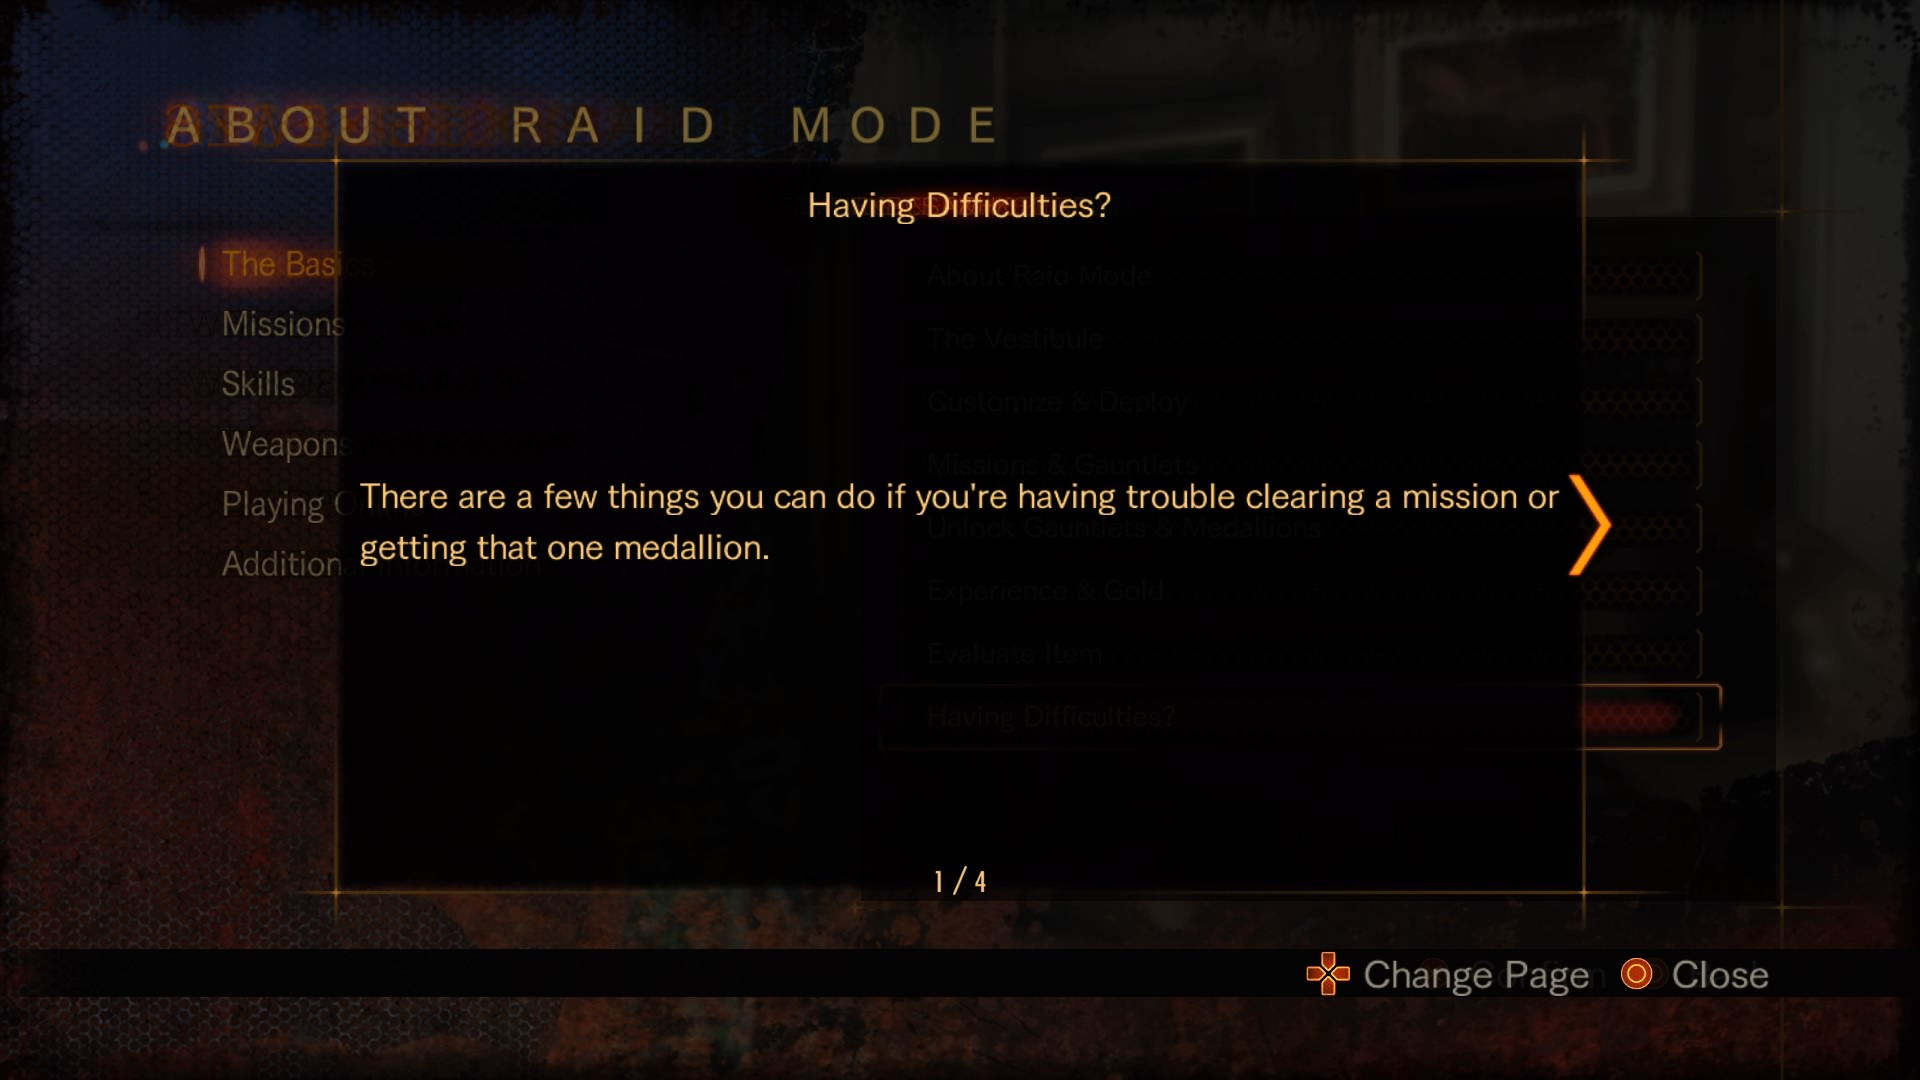 Having Difficulties?